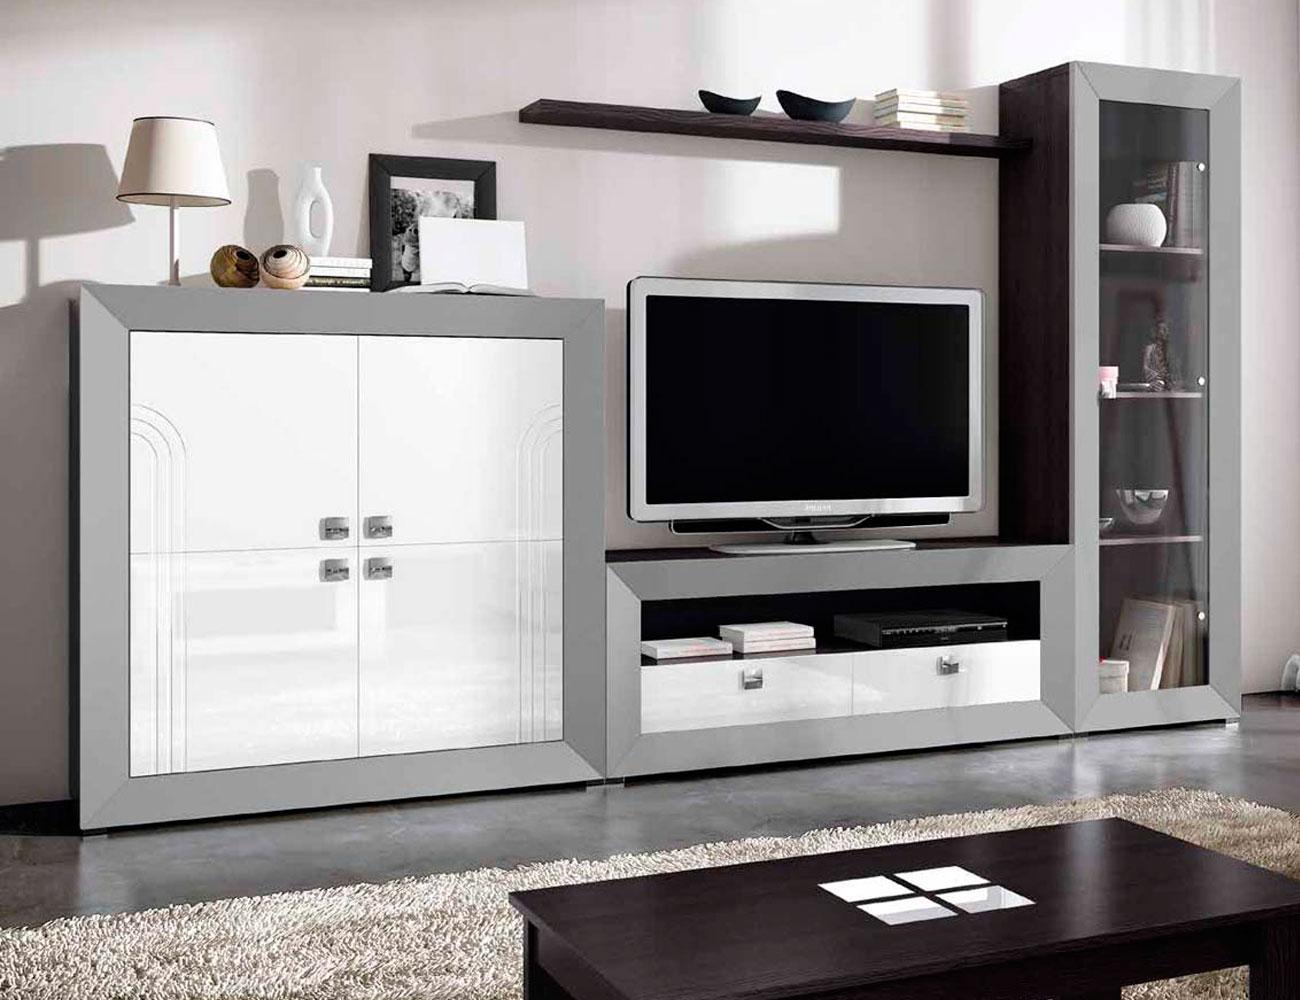 Mueble de sal n modular moderno lacado factory del - Mueble salon modular ...